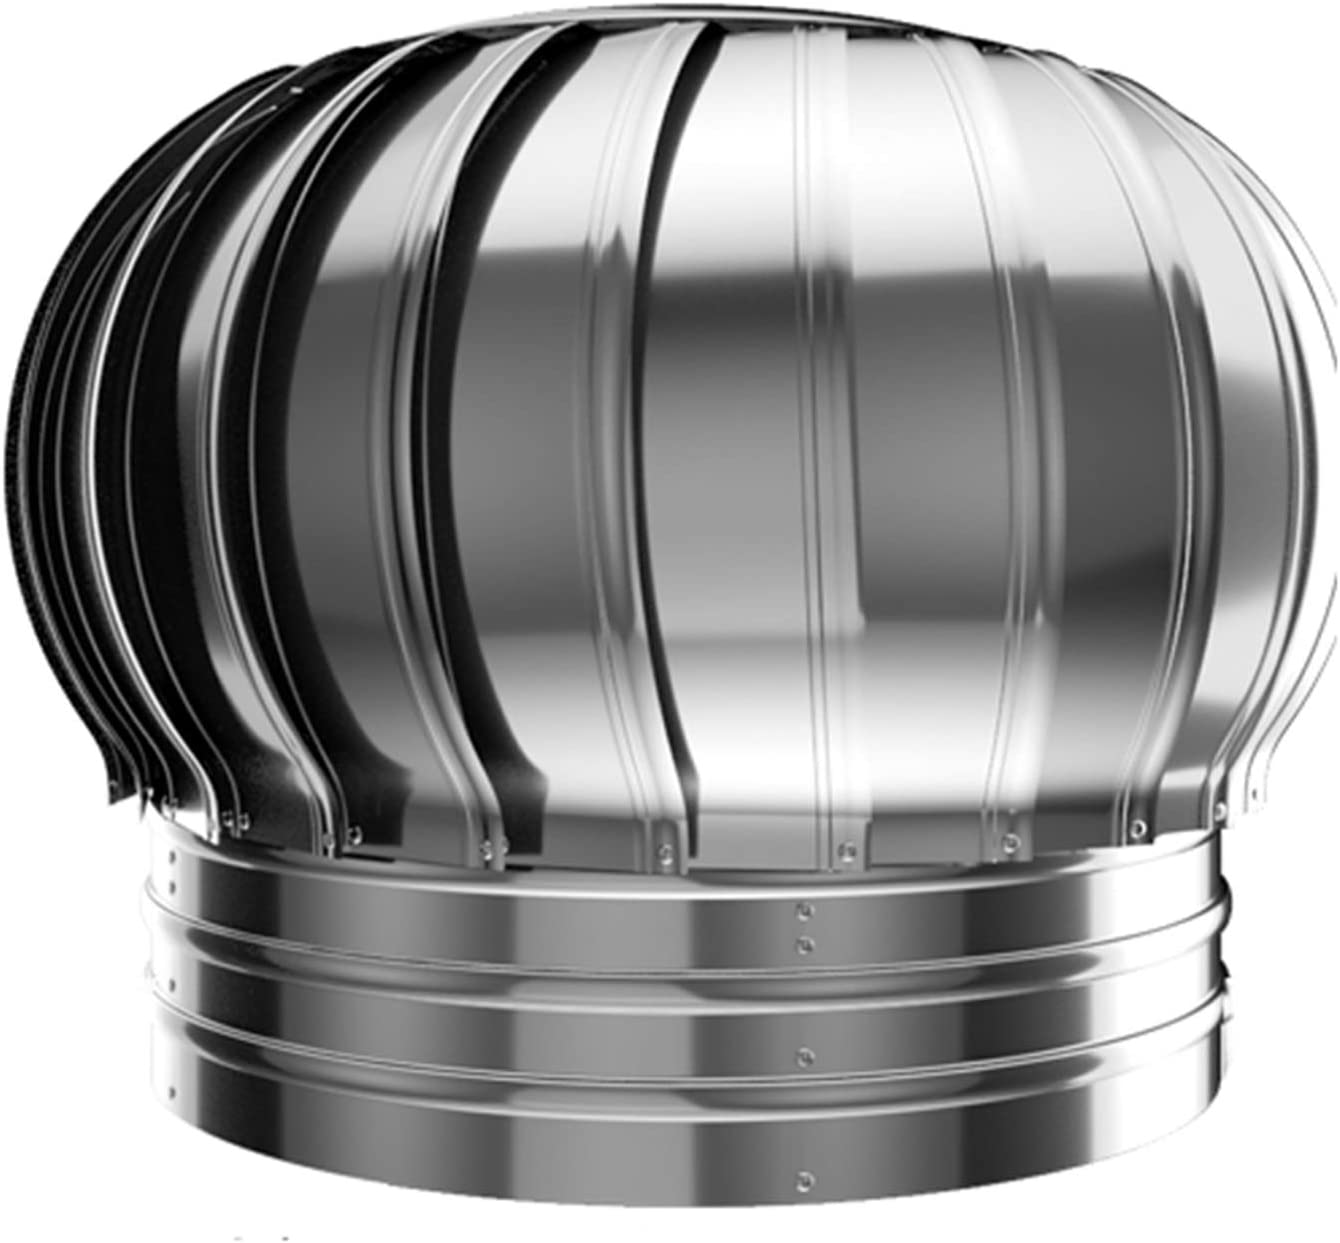 LTLWSH Sombrero Extractor de Humos Giratorio, Extractor de Humo Giratorio de Viento Inoxidable, Base Redonda, Sombrero Eolico de Chimenea,200mm